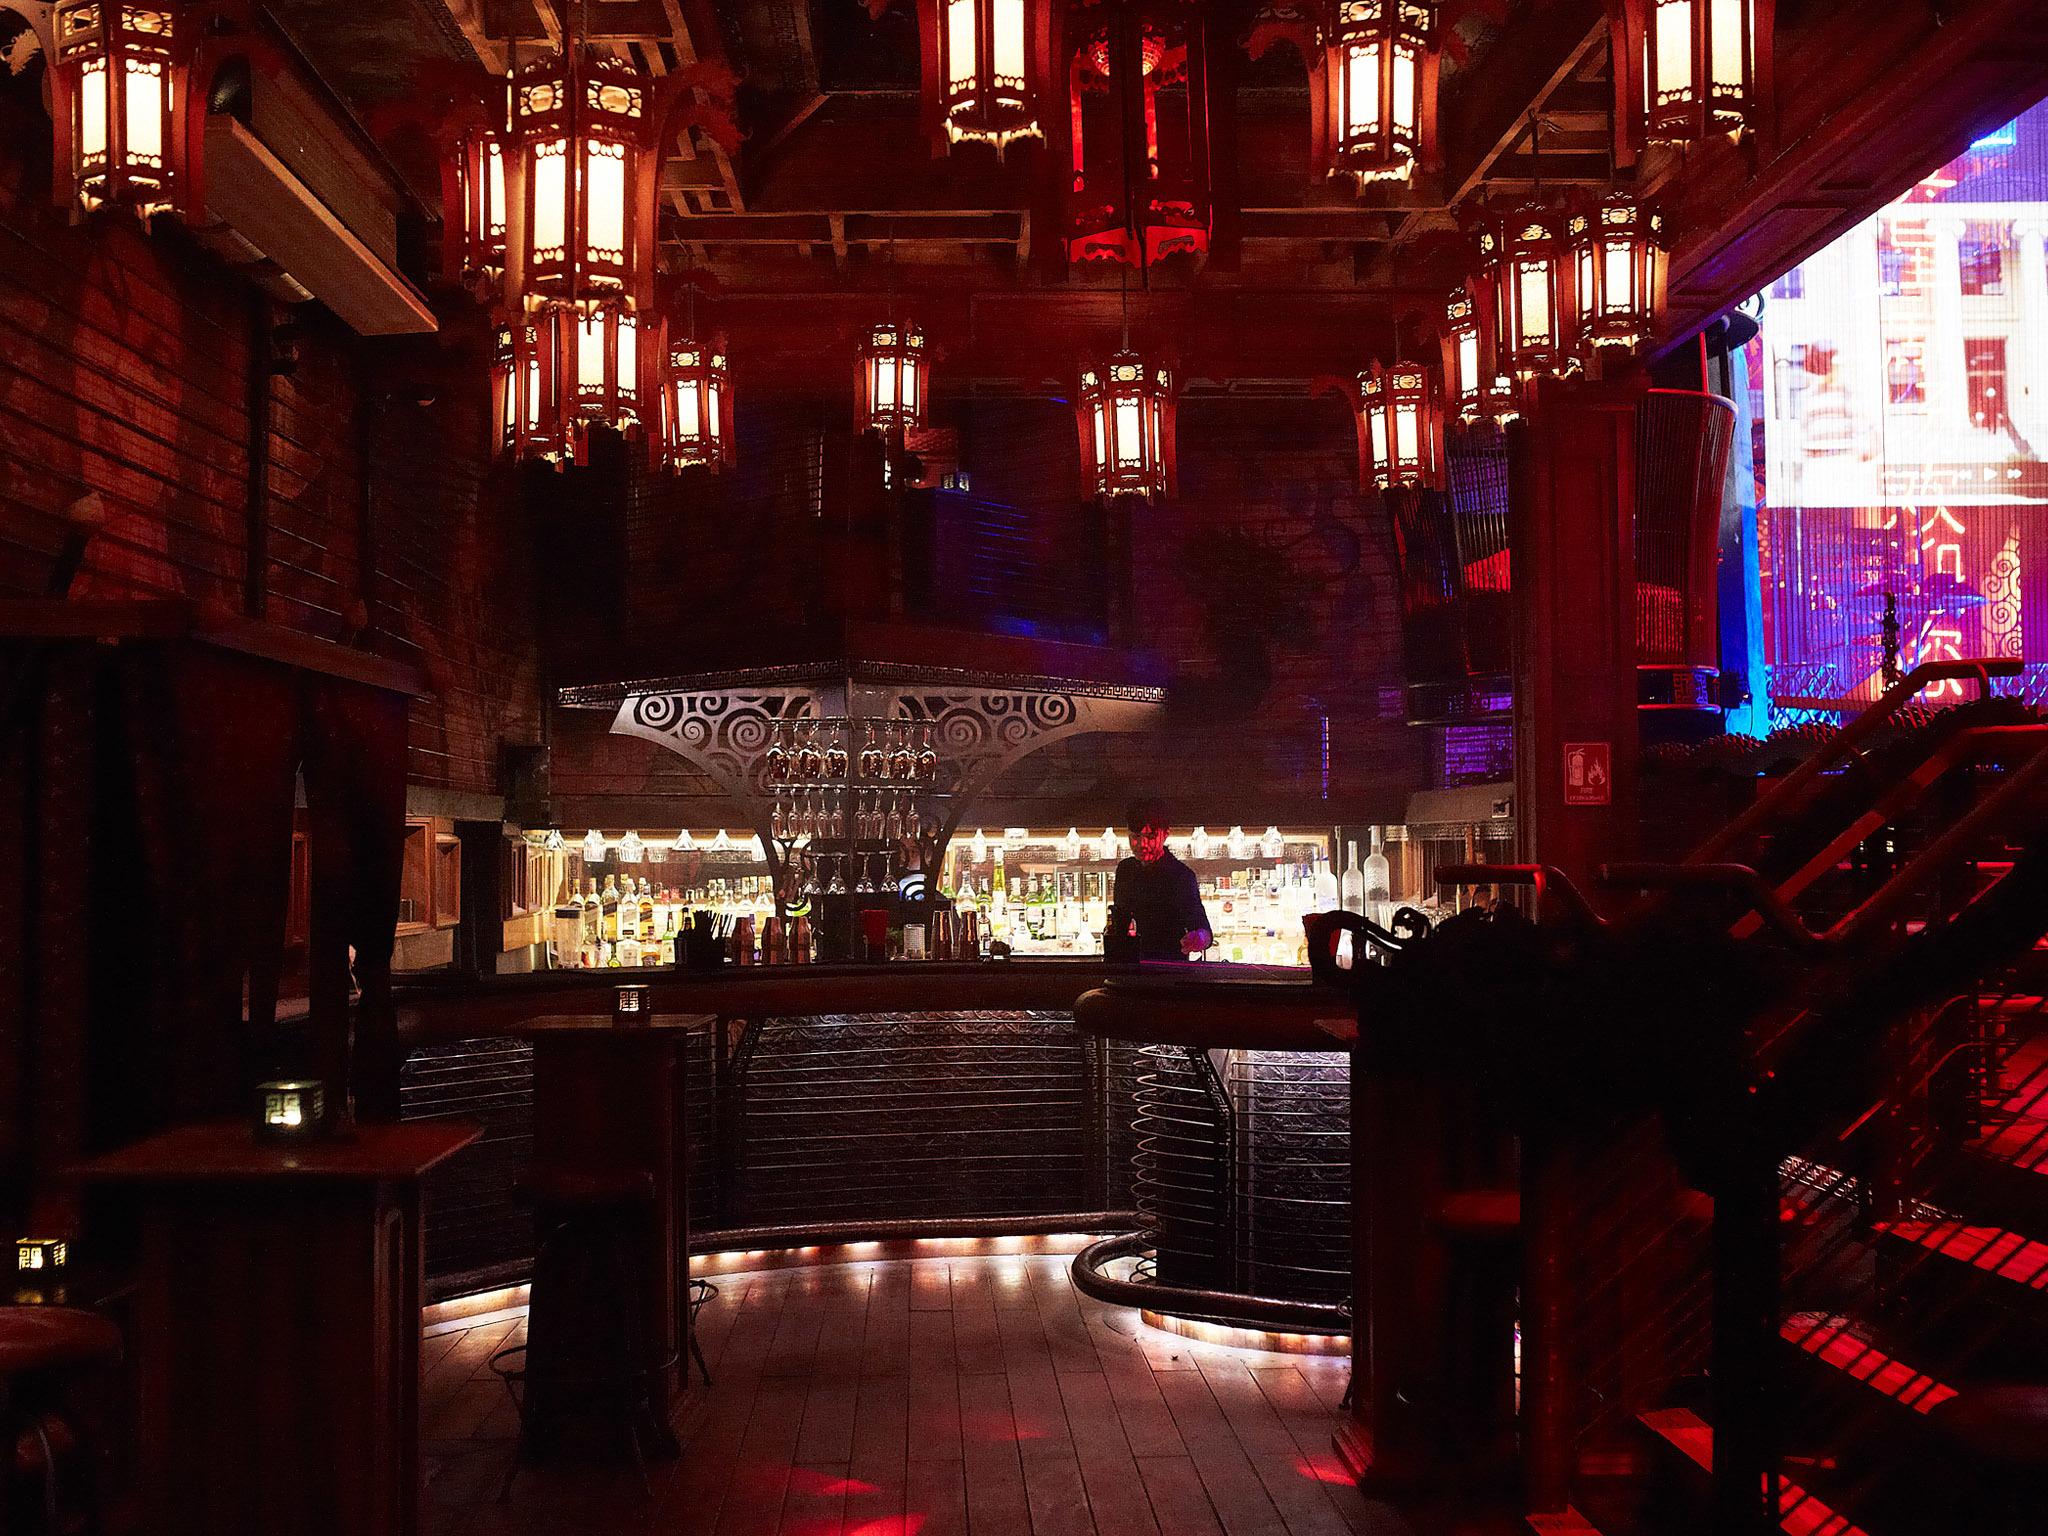 Metalwork, wood, lanterns and neon lights decor